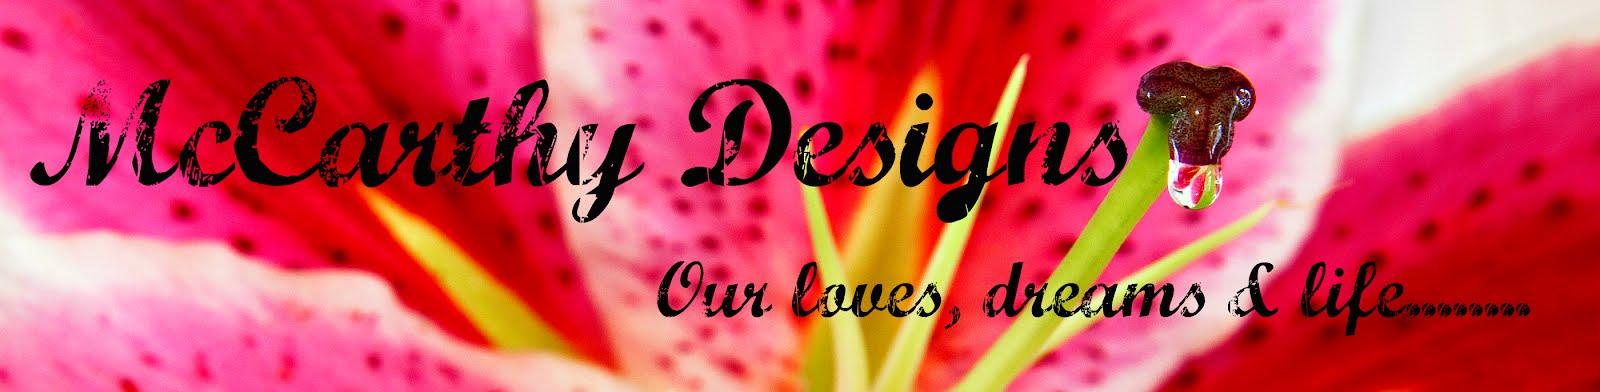 McCarthy Designs